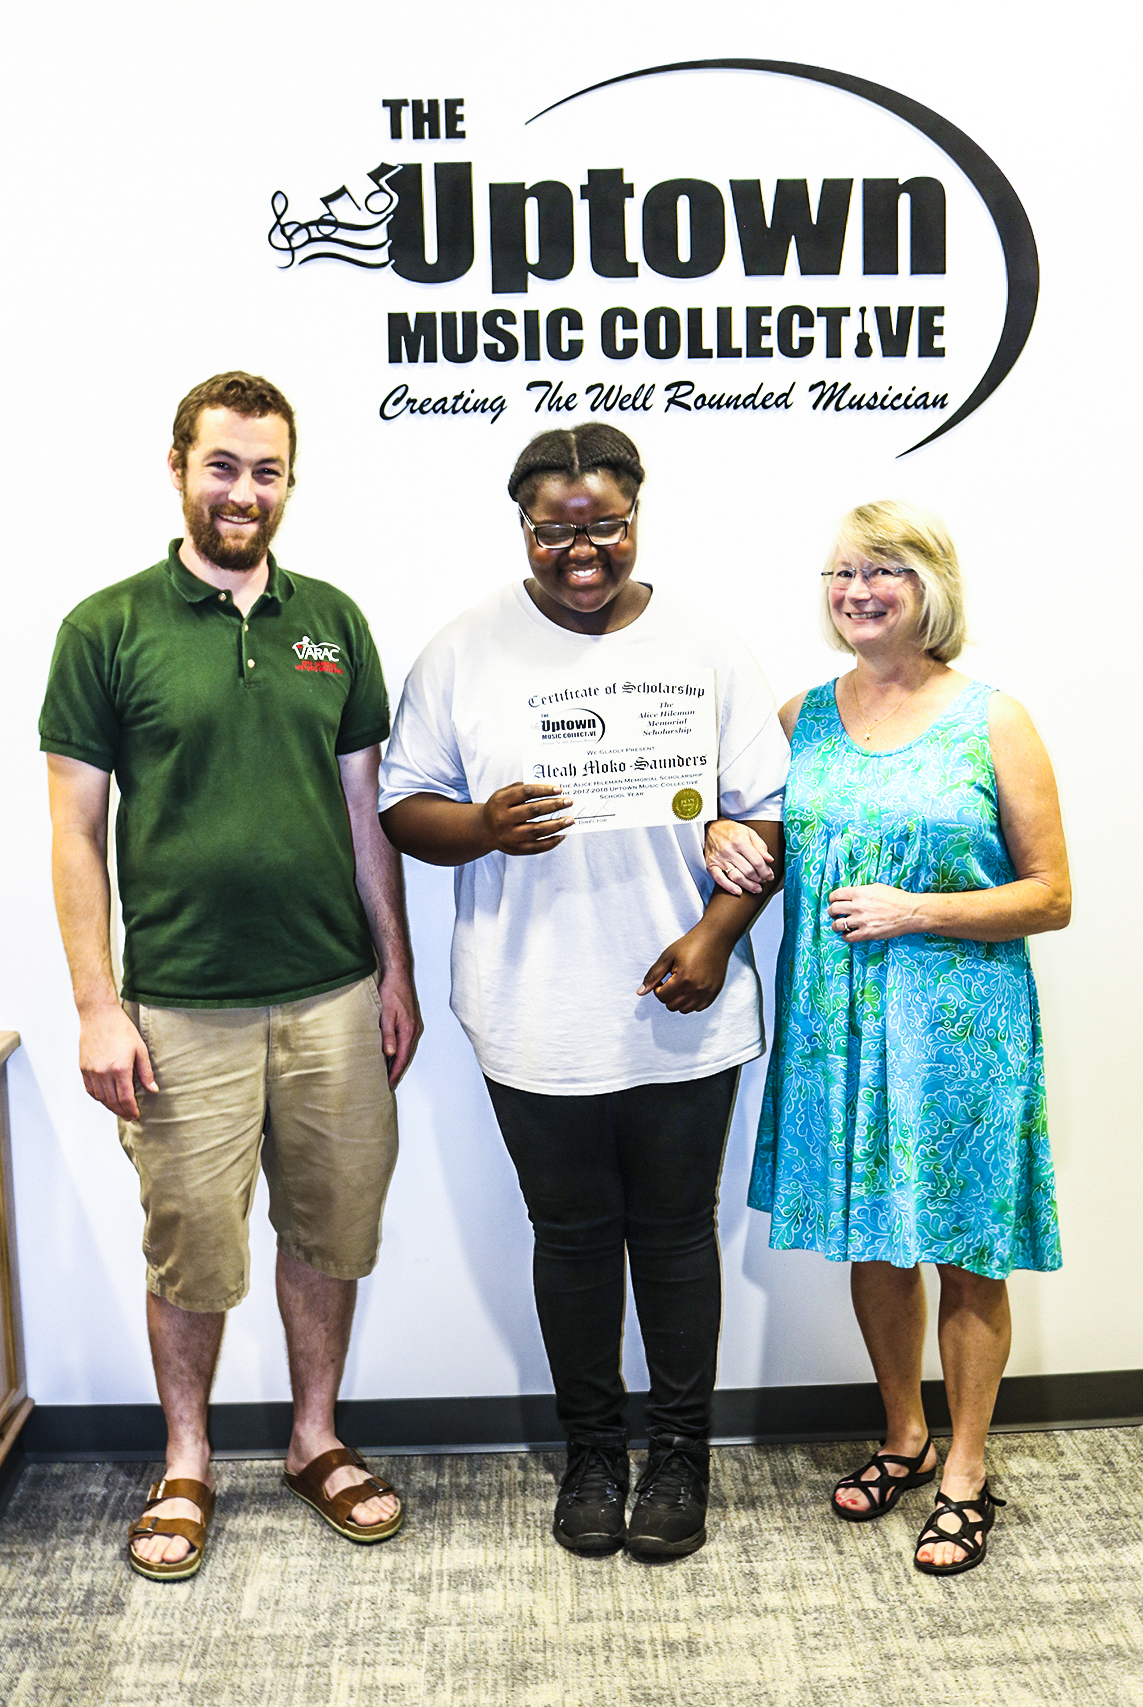 The Alice Hileman Memorial Scholarship Awarded to Aleah Moko - Saunders